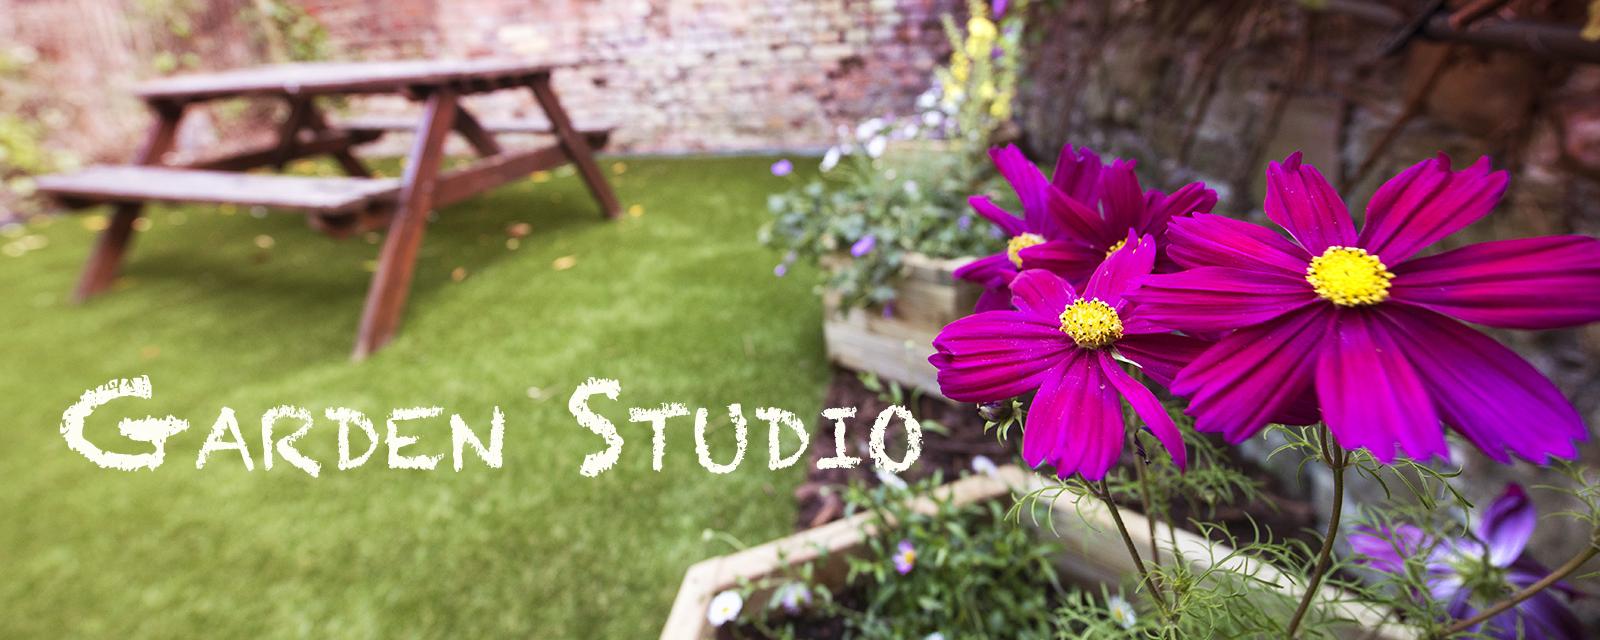 Natural light outdoor garden photography studio